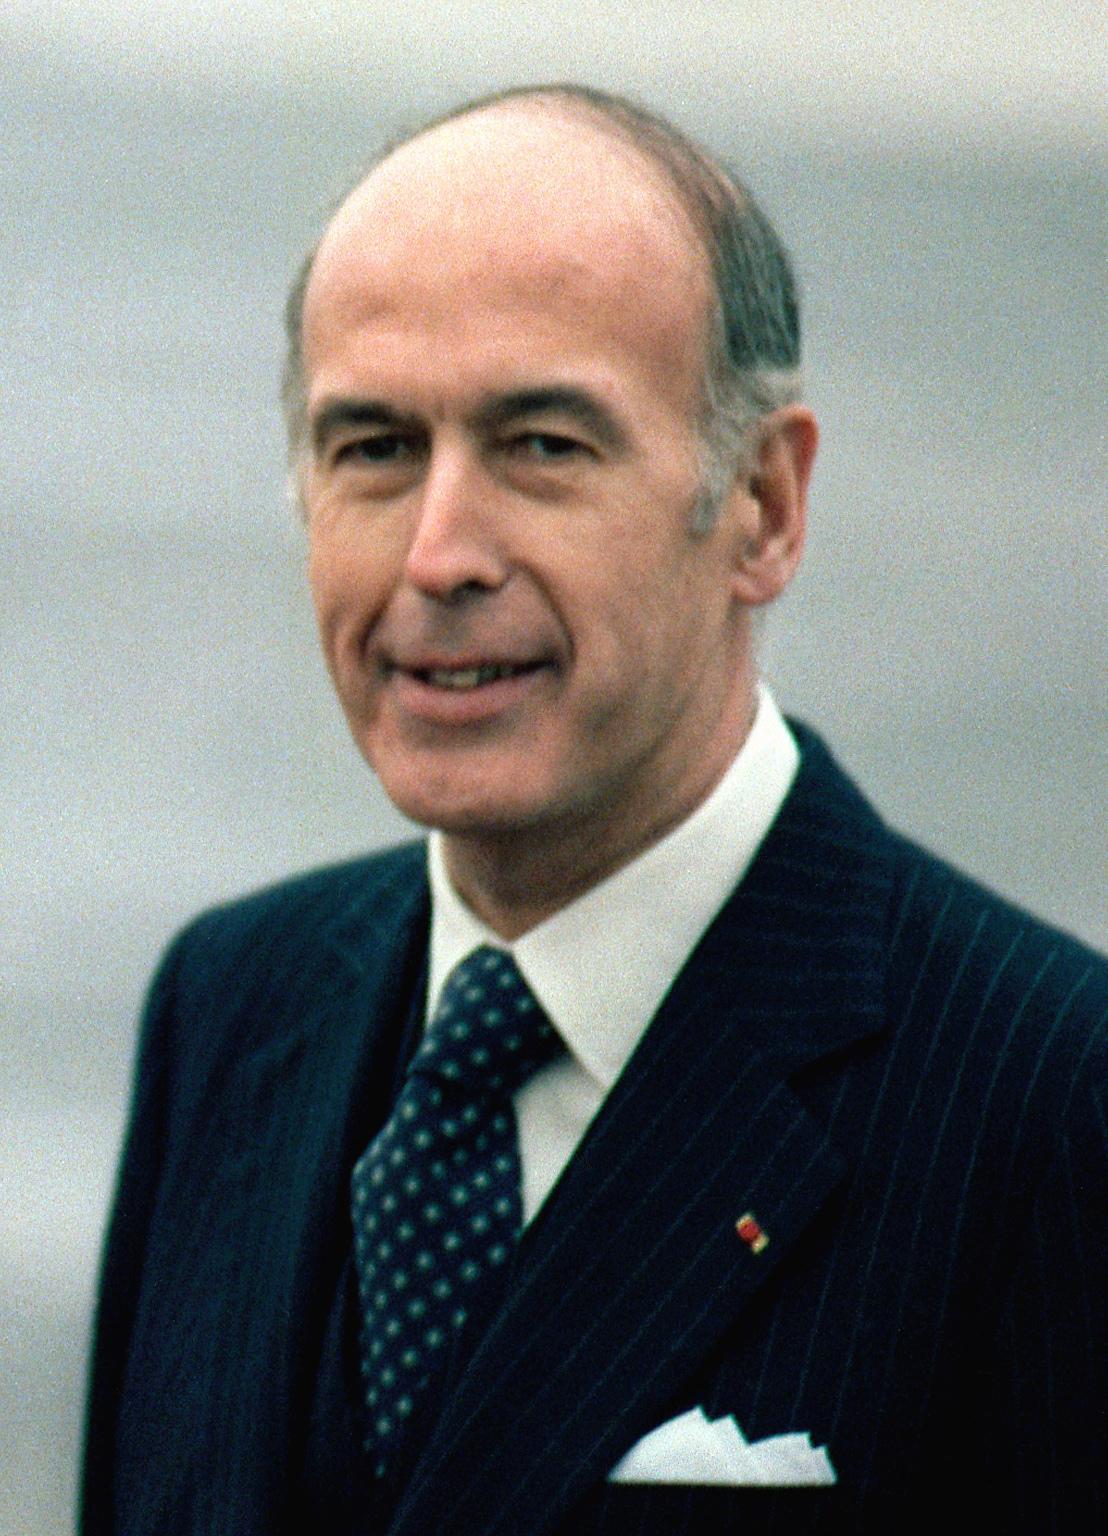 Val%C3%A9ry Giscard d%E2%80%99Estaing 1978(3).jpg